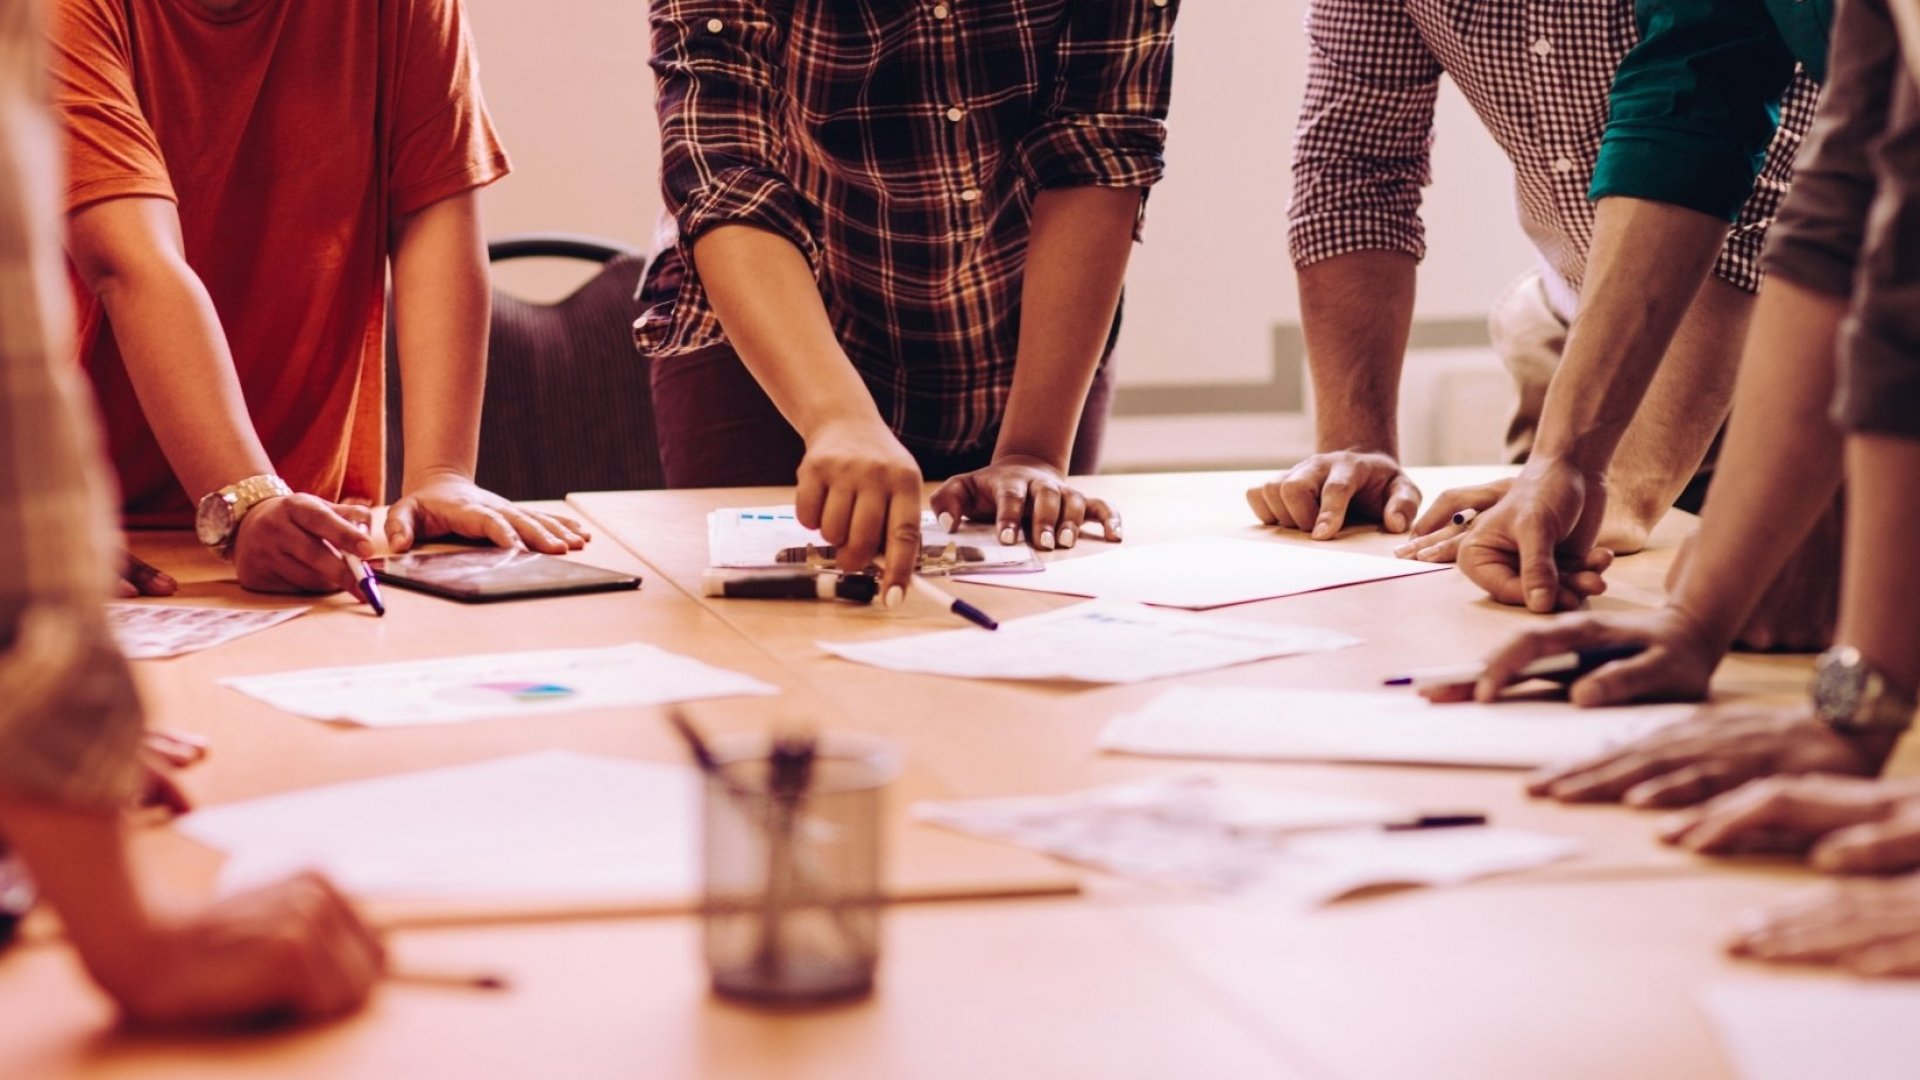 Collaboration Kills Creativity, According to Science